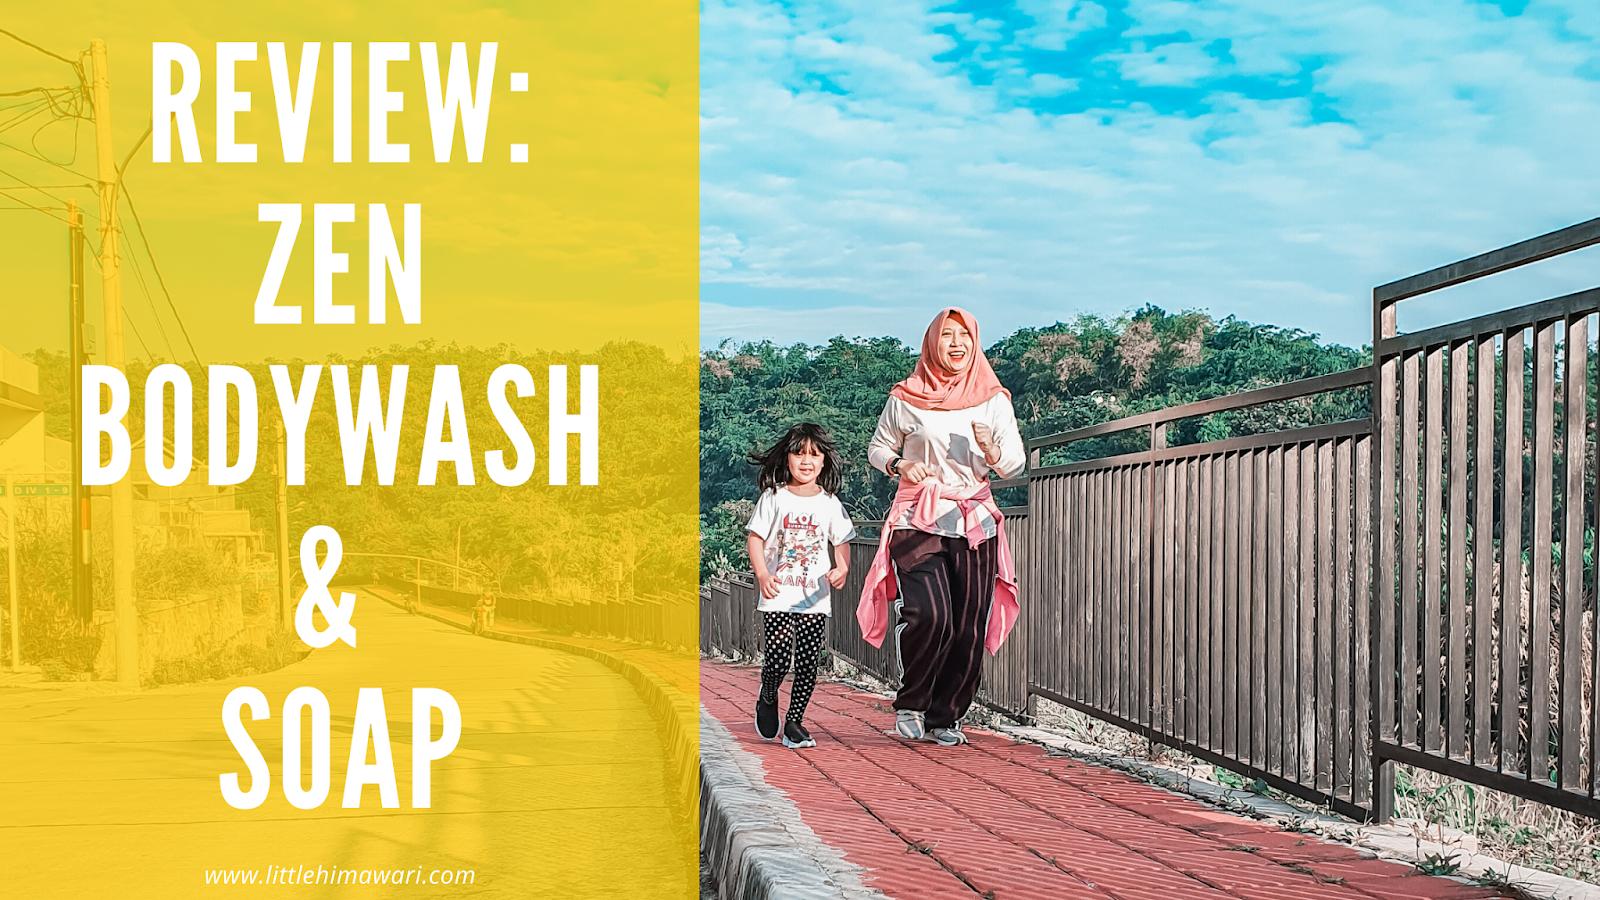 REVIEW ZEN BODYWASH AND SOAP